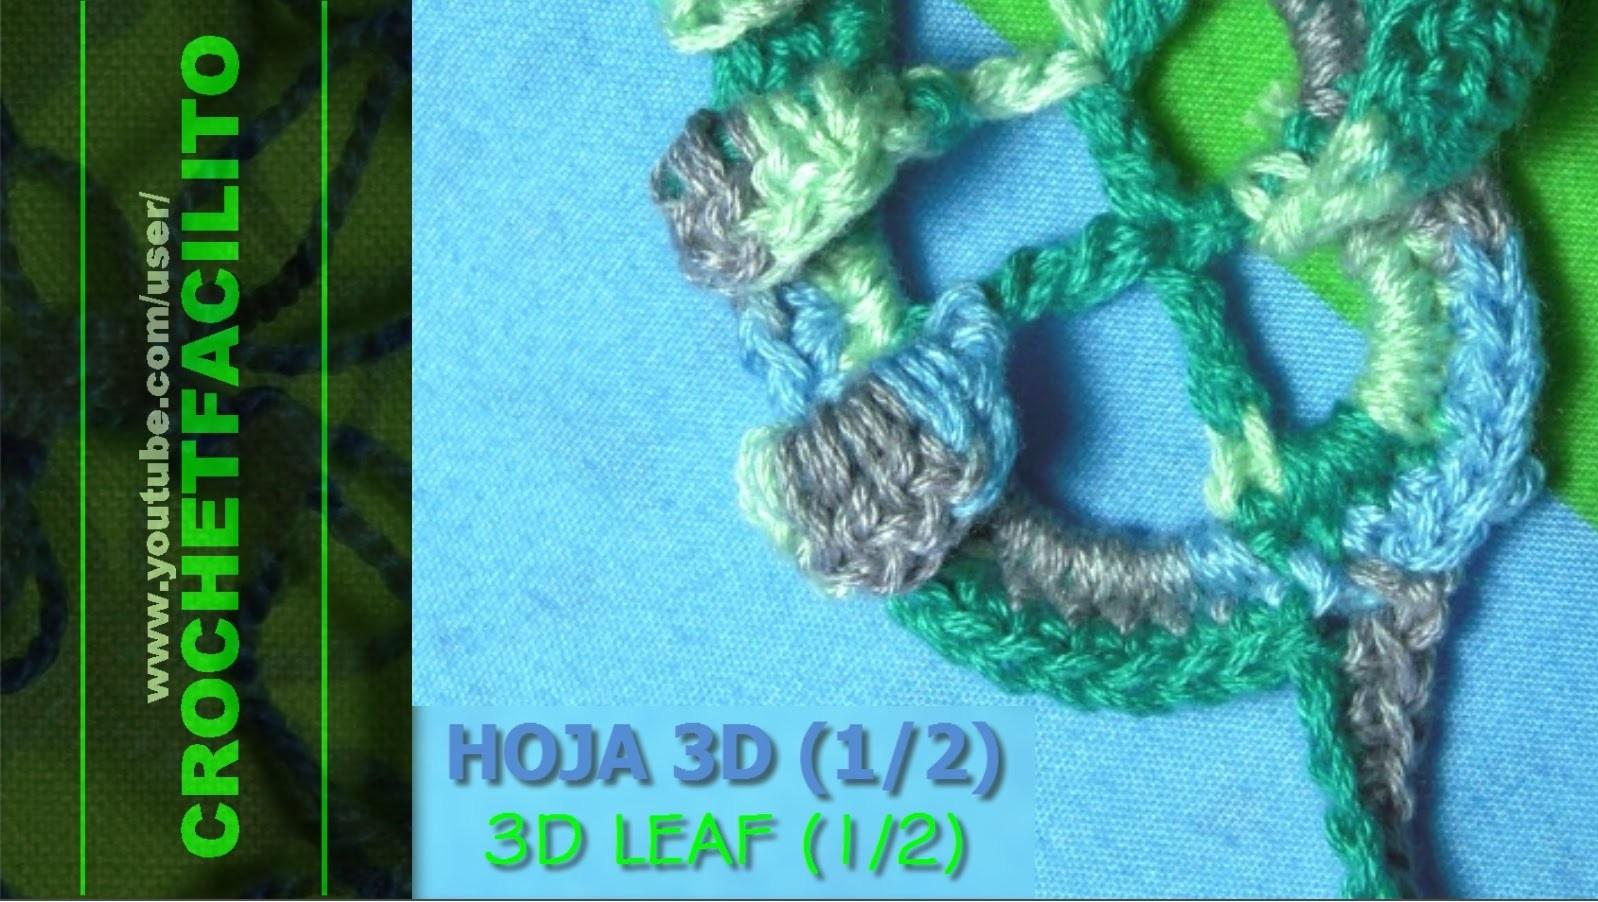 CROCHET - HOJA 3D (1.2) - 3D LEAF (1.2)